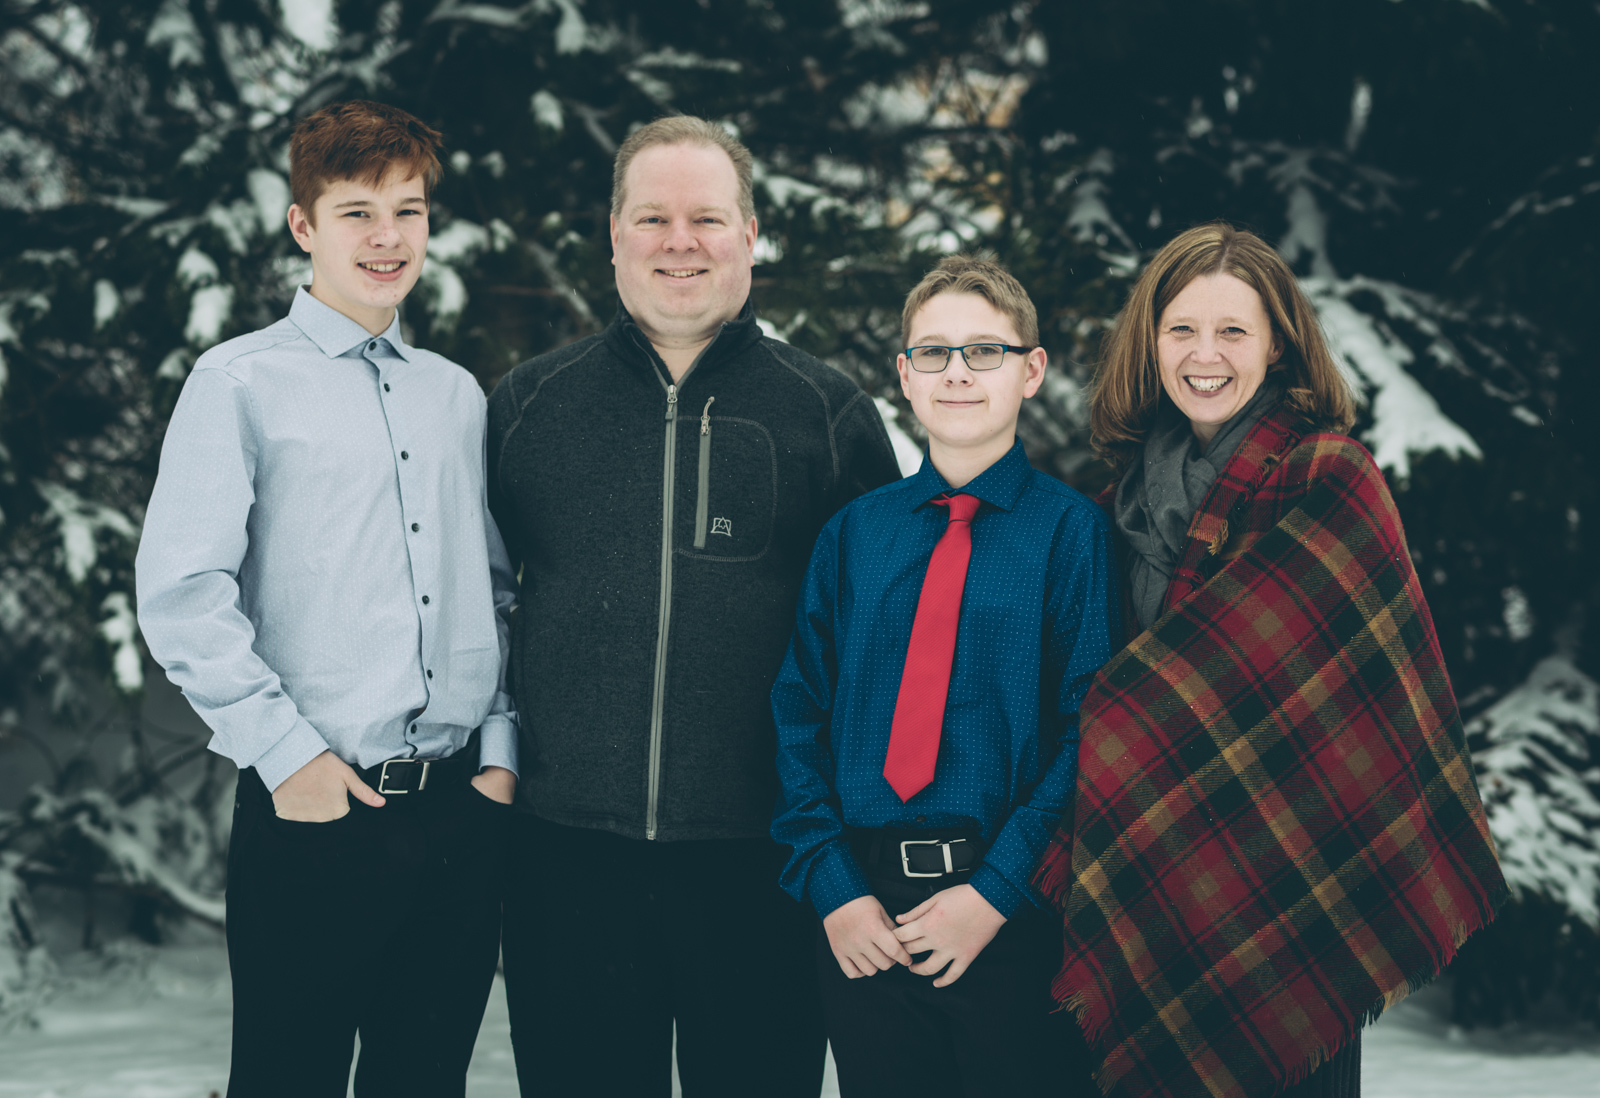 ashlyn-family-portraits-blog-19.jpg